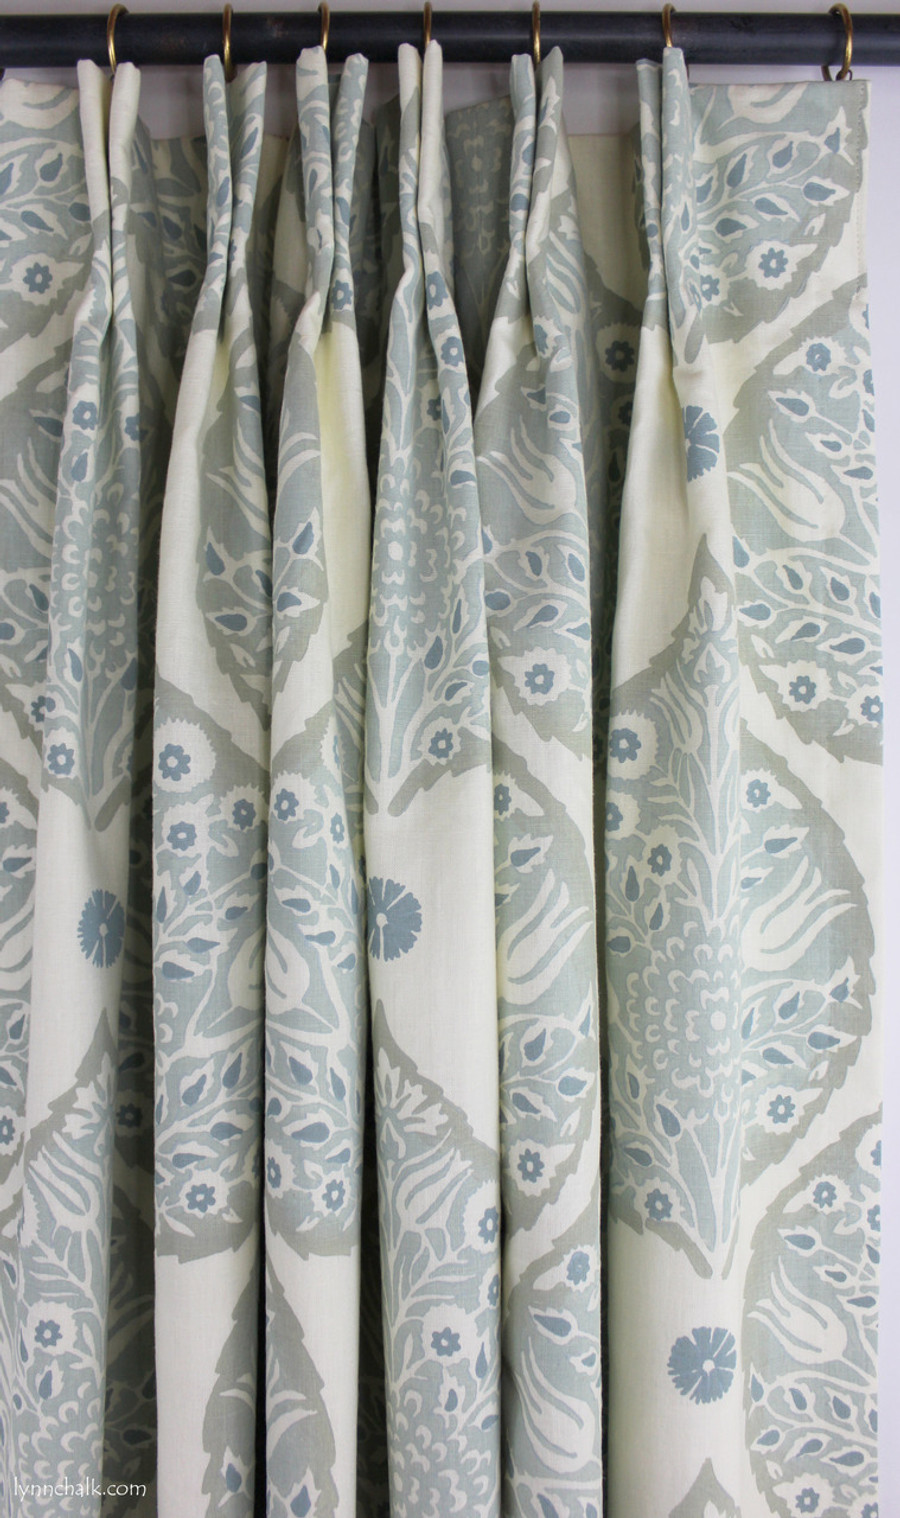 Galbraith & Paul Lotus Double Wide Roman Shade in Custom Colors